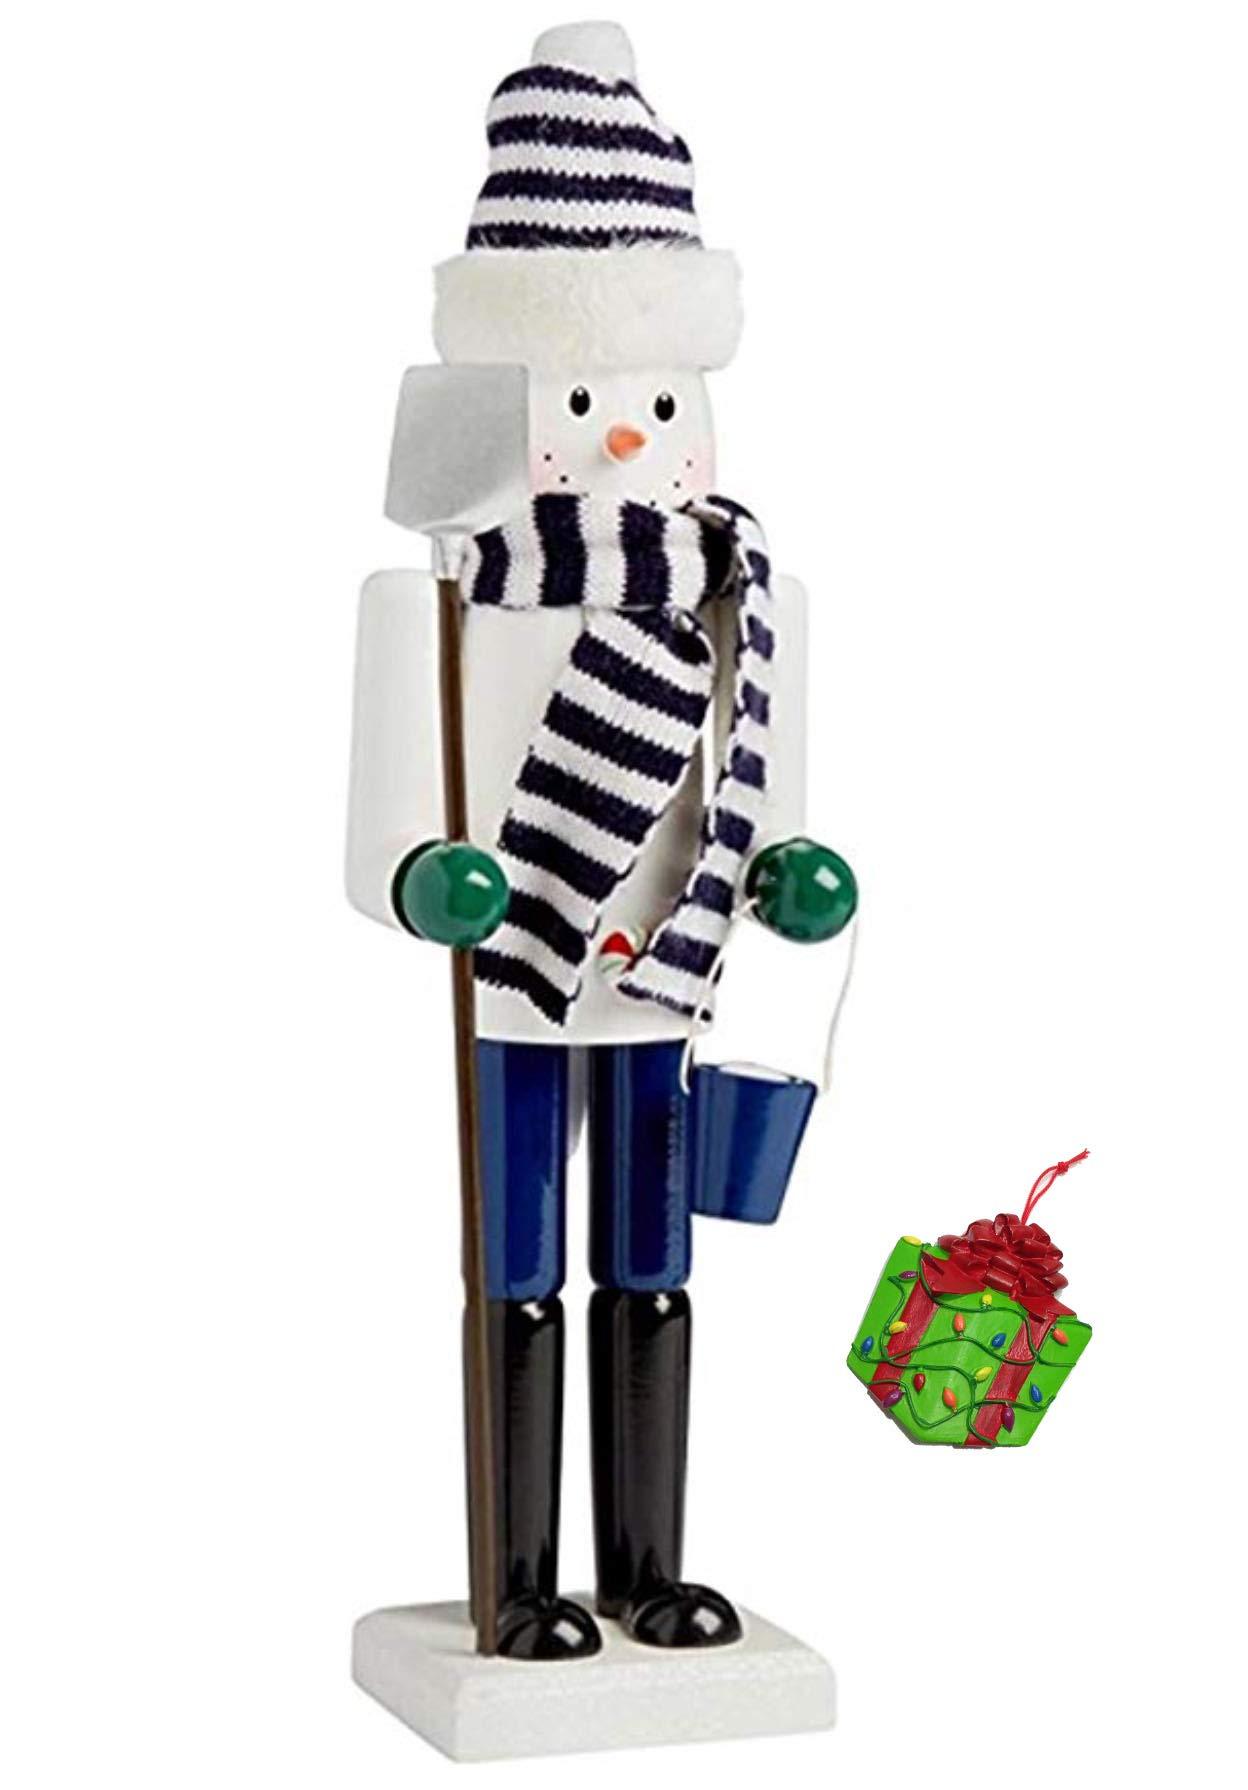 Distinctive Designs Snowman with Shovel Large Unique Themed Decorative Holiday Season Wooden Christmas Nutcracker & Bonus Tree Ornament